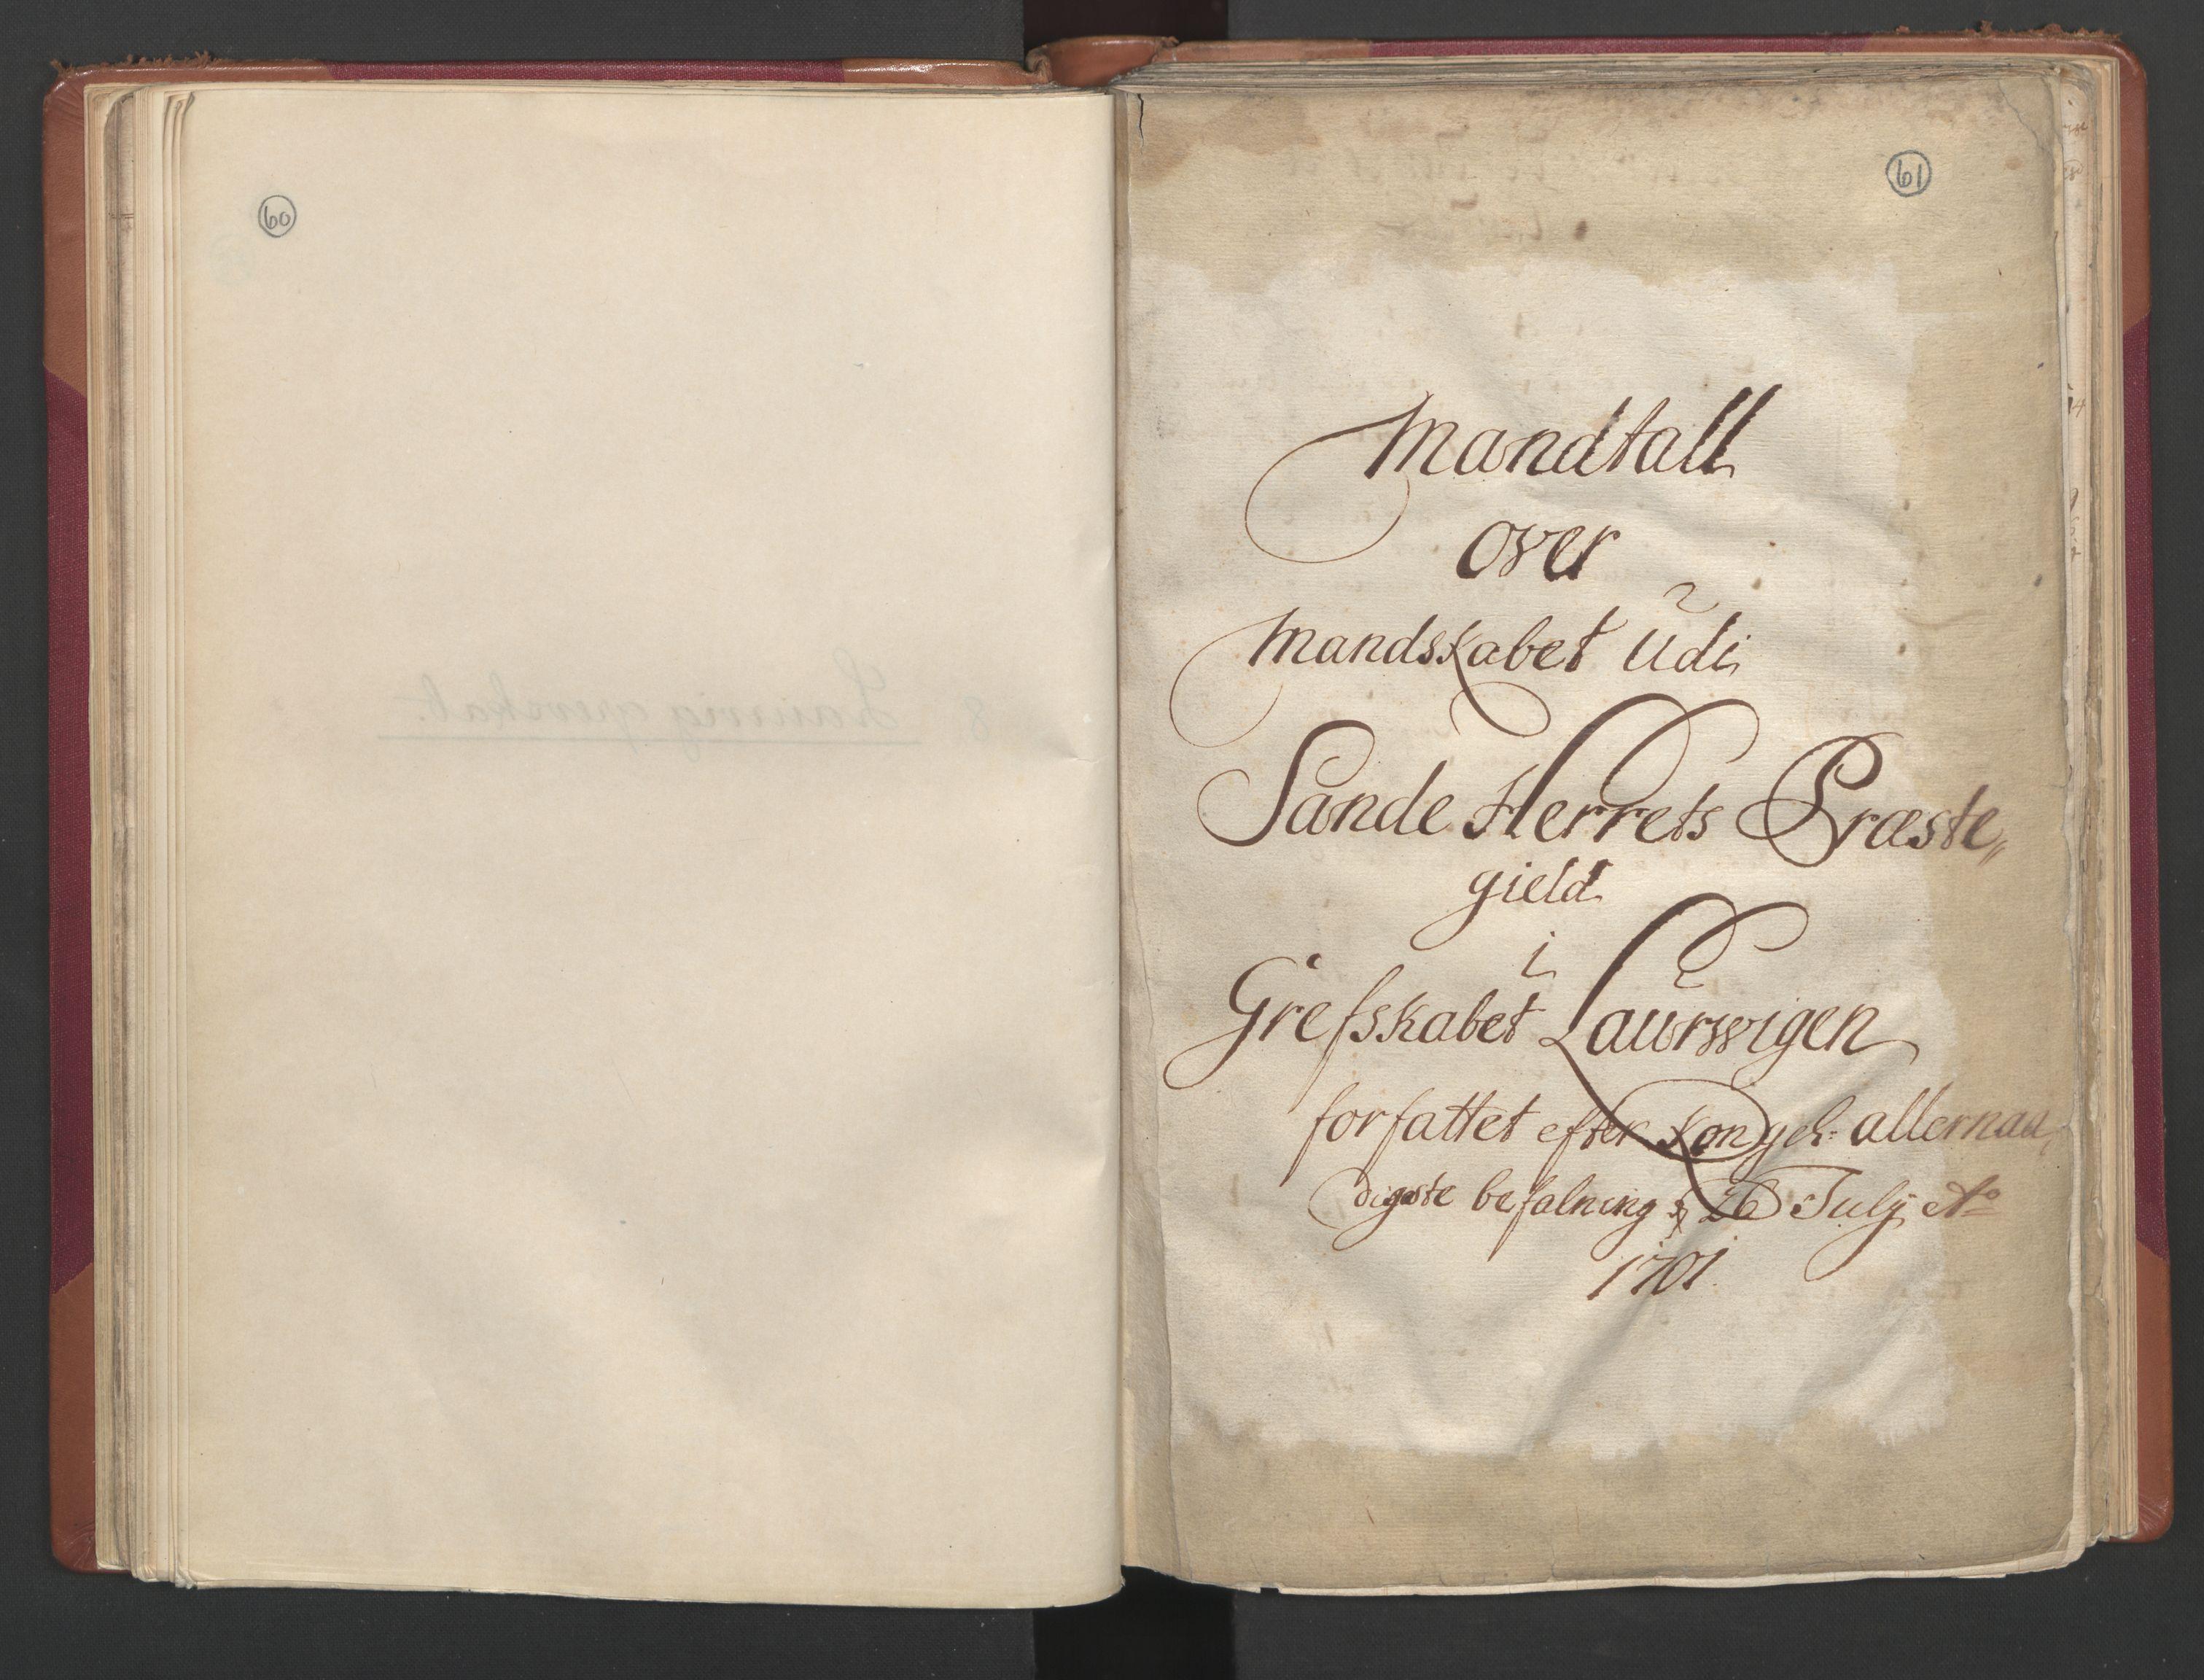 RA, Manntallet 1701, nr. 2: Solør, Odal og Østerdal fogderi og Larvik grevskap, 1701, s. 60-61